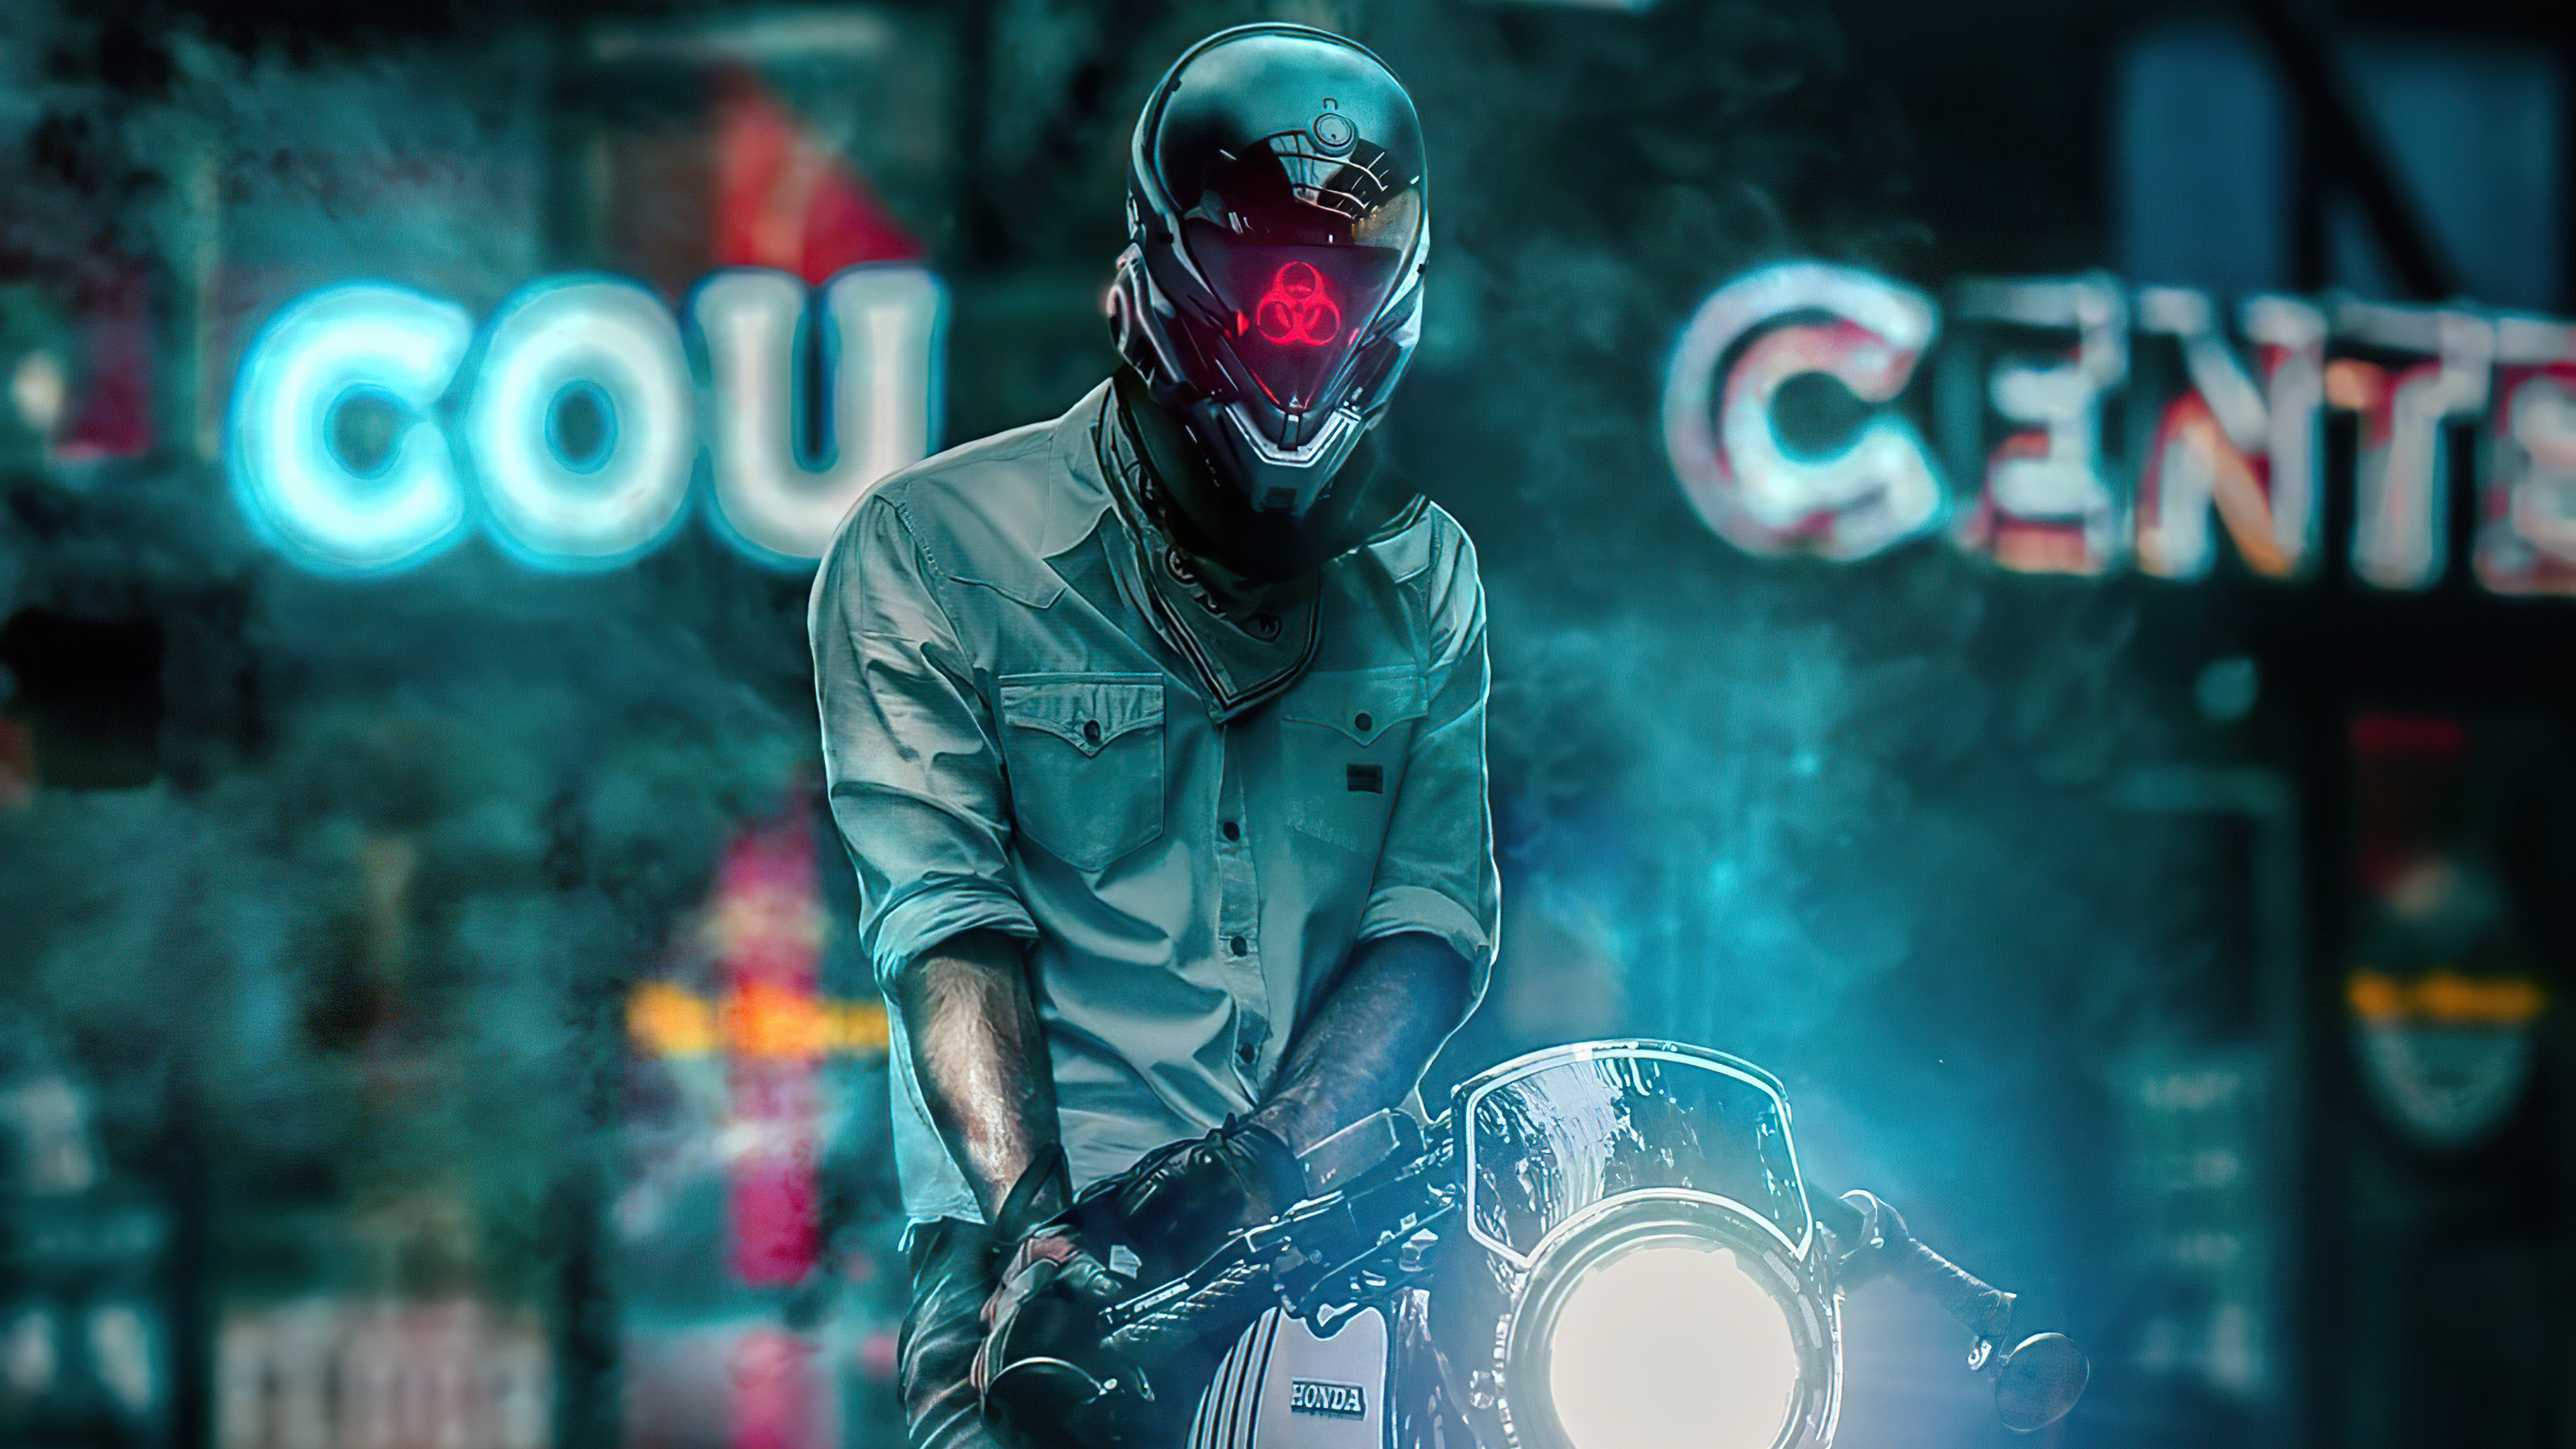 scifi biker boy 4k 1618133576 - Scifi Biker Boy 4k - Scifi Biker Boy 4k wallpapers